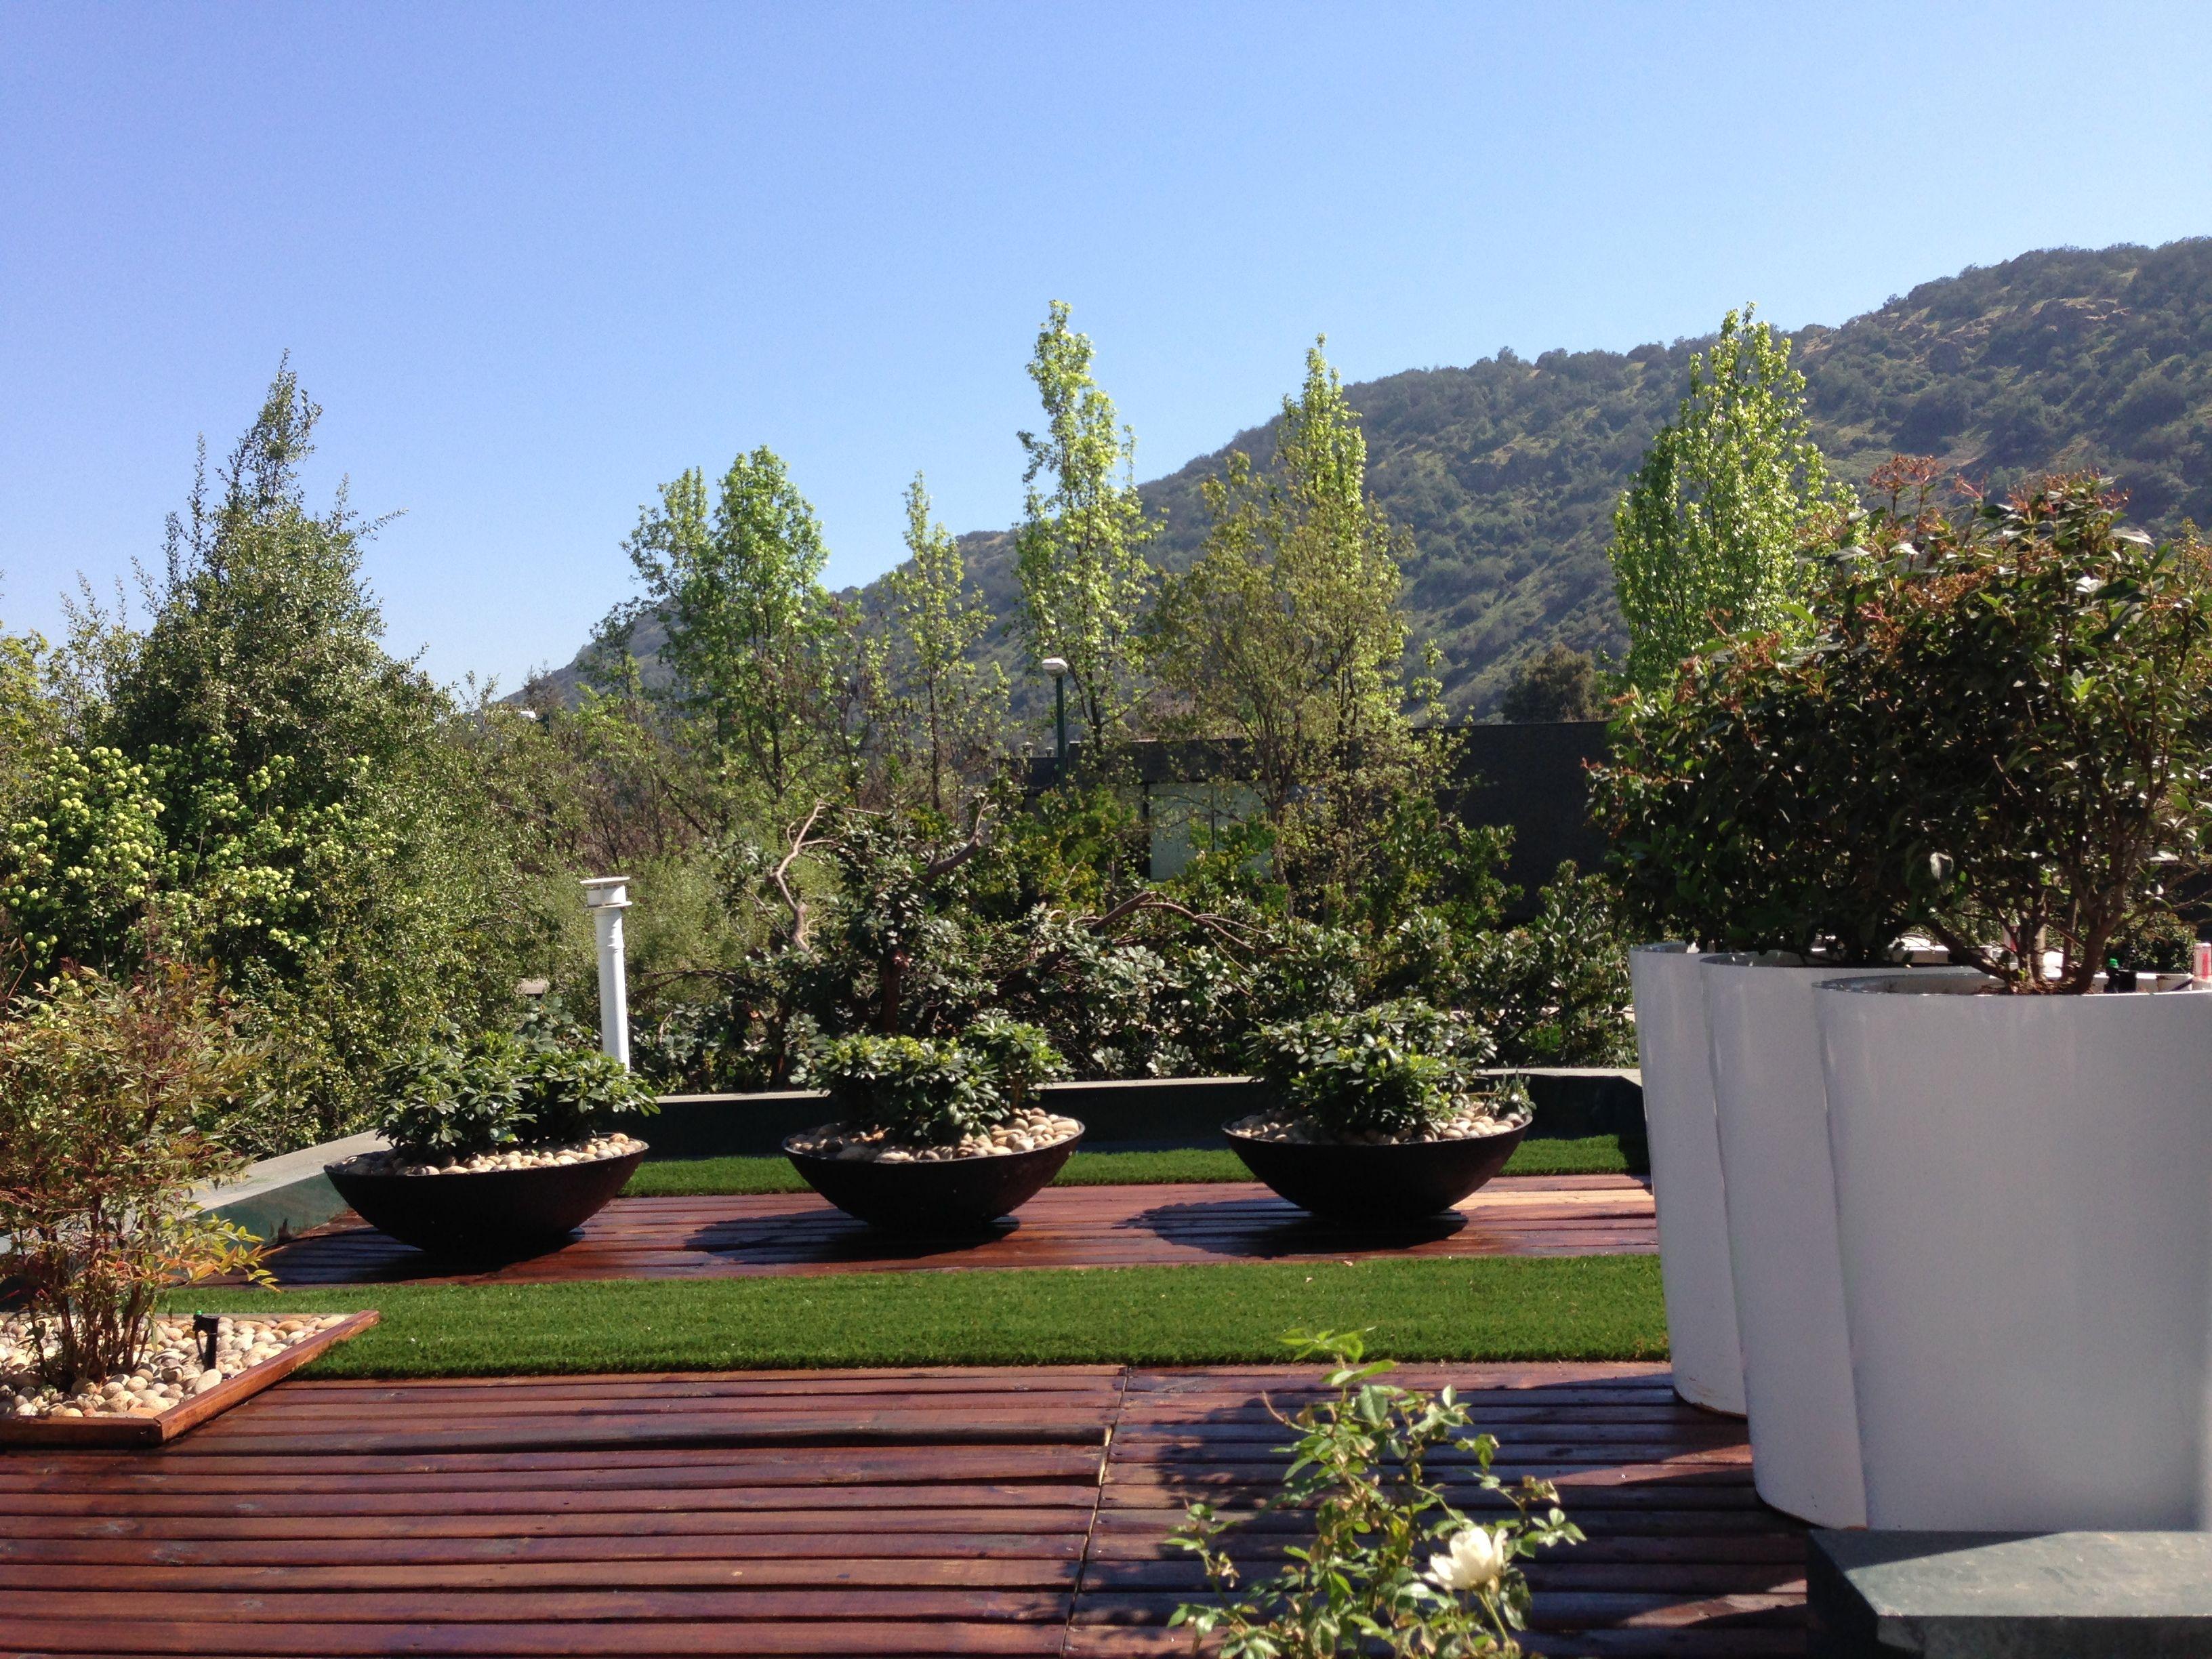 Techo en santiago de chile jardines modernos pinterest - Jardines modernos ...